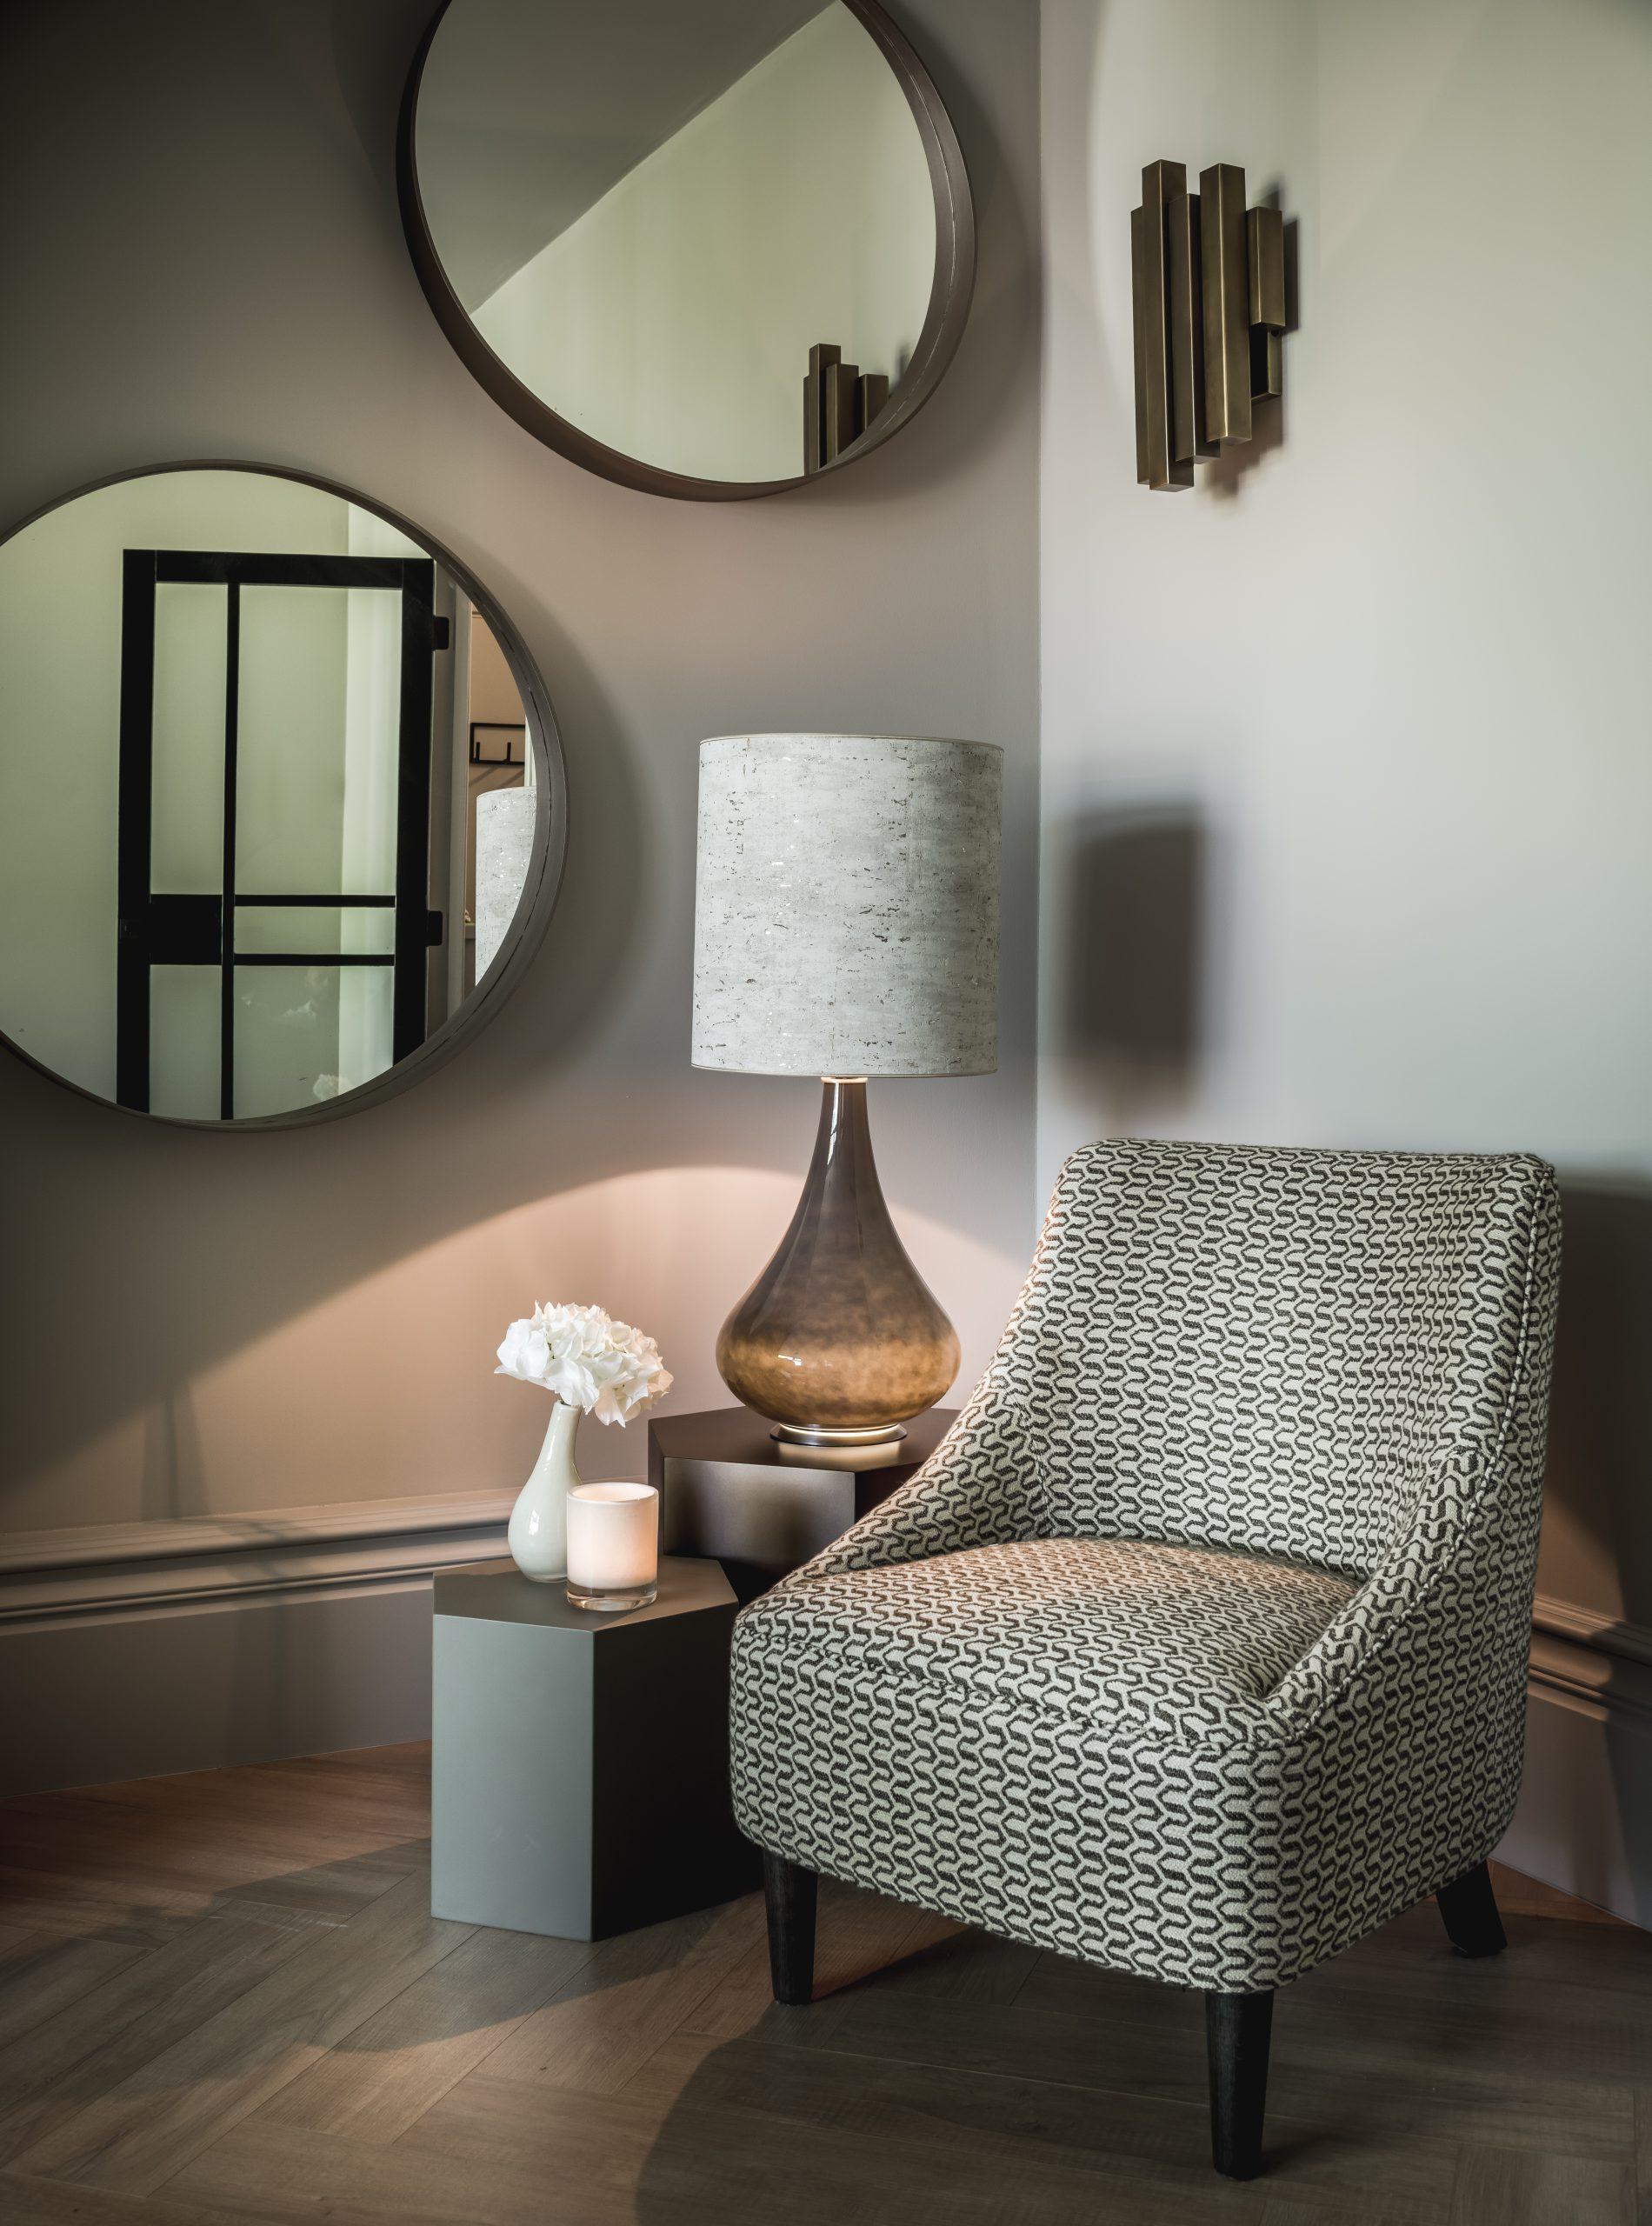 Exclusieve wandafwerking interieur. Elitis behang #behang #interieur #wandafwerking #kleur #elitis